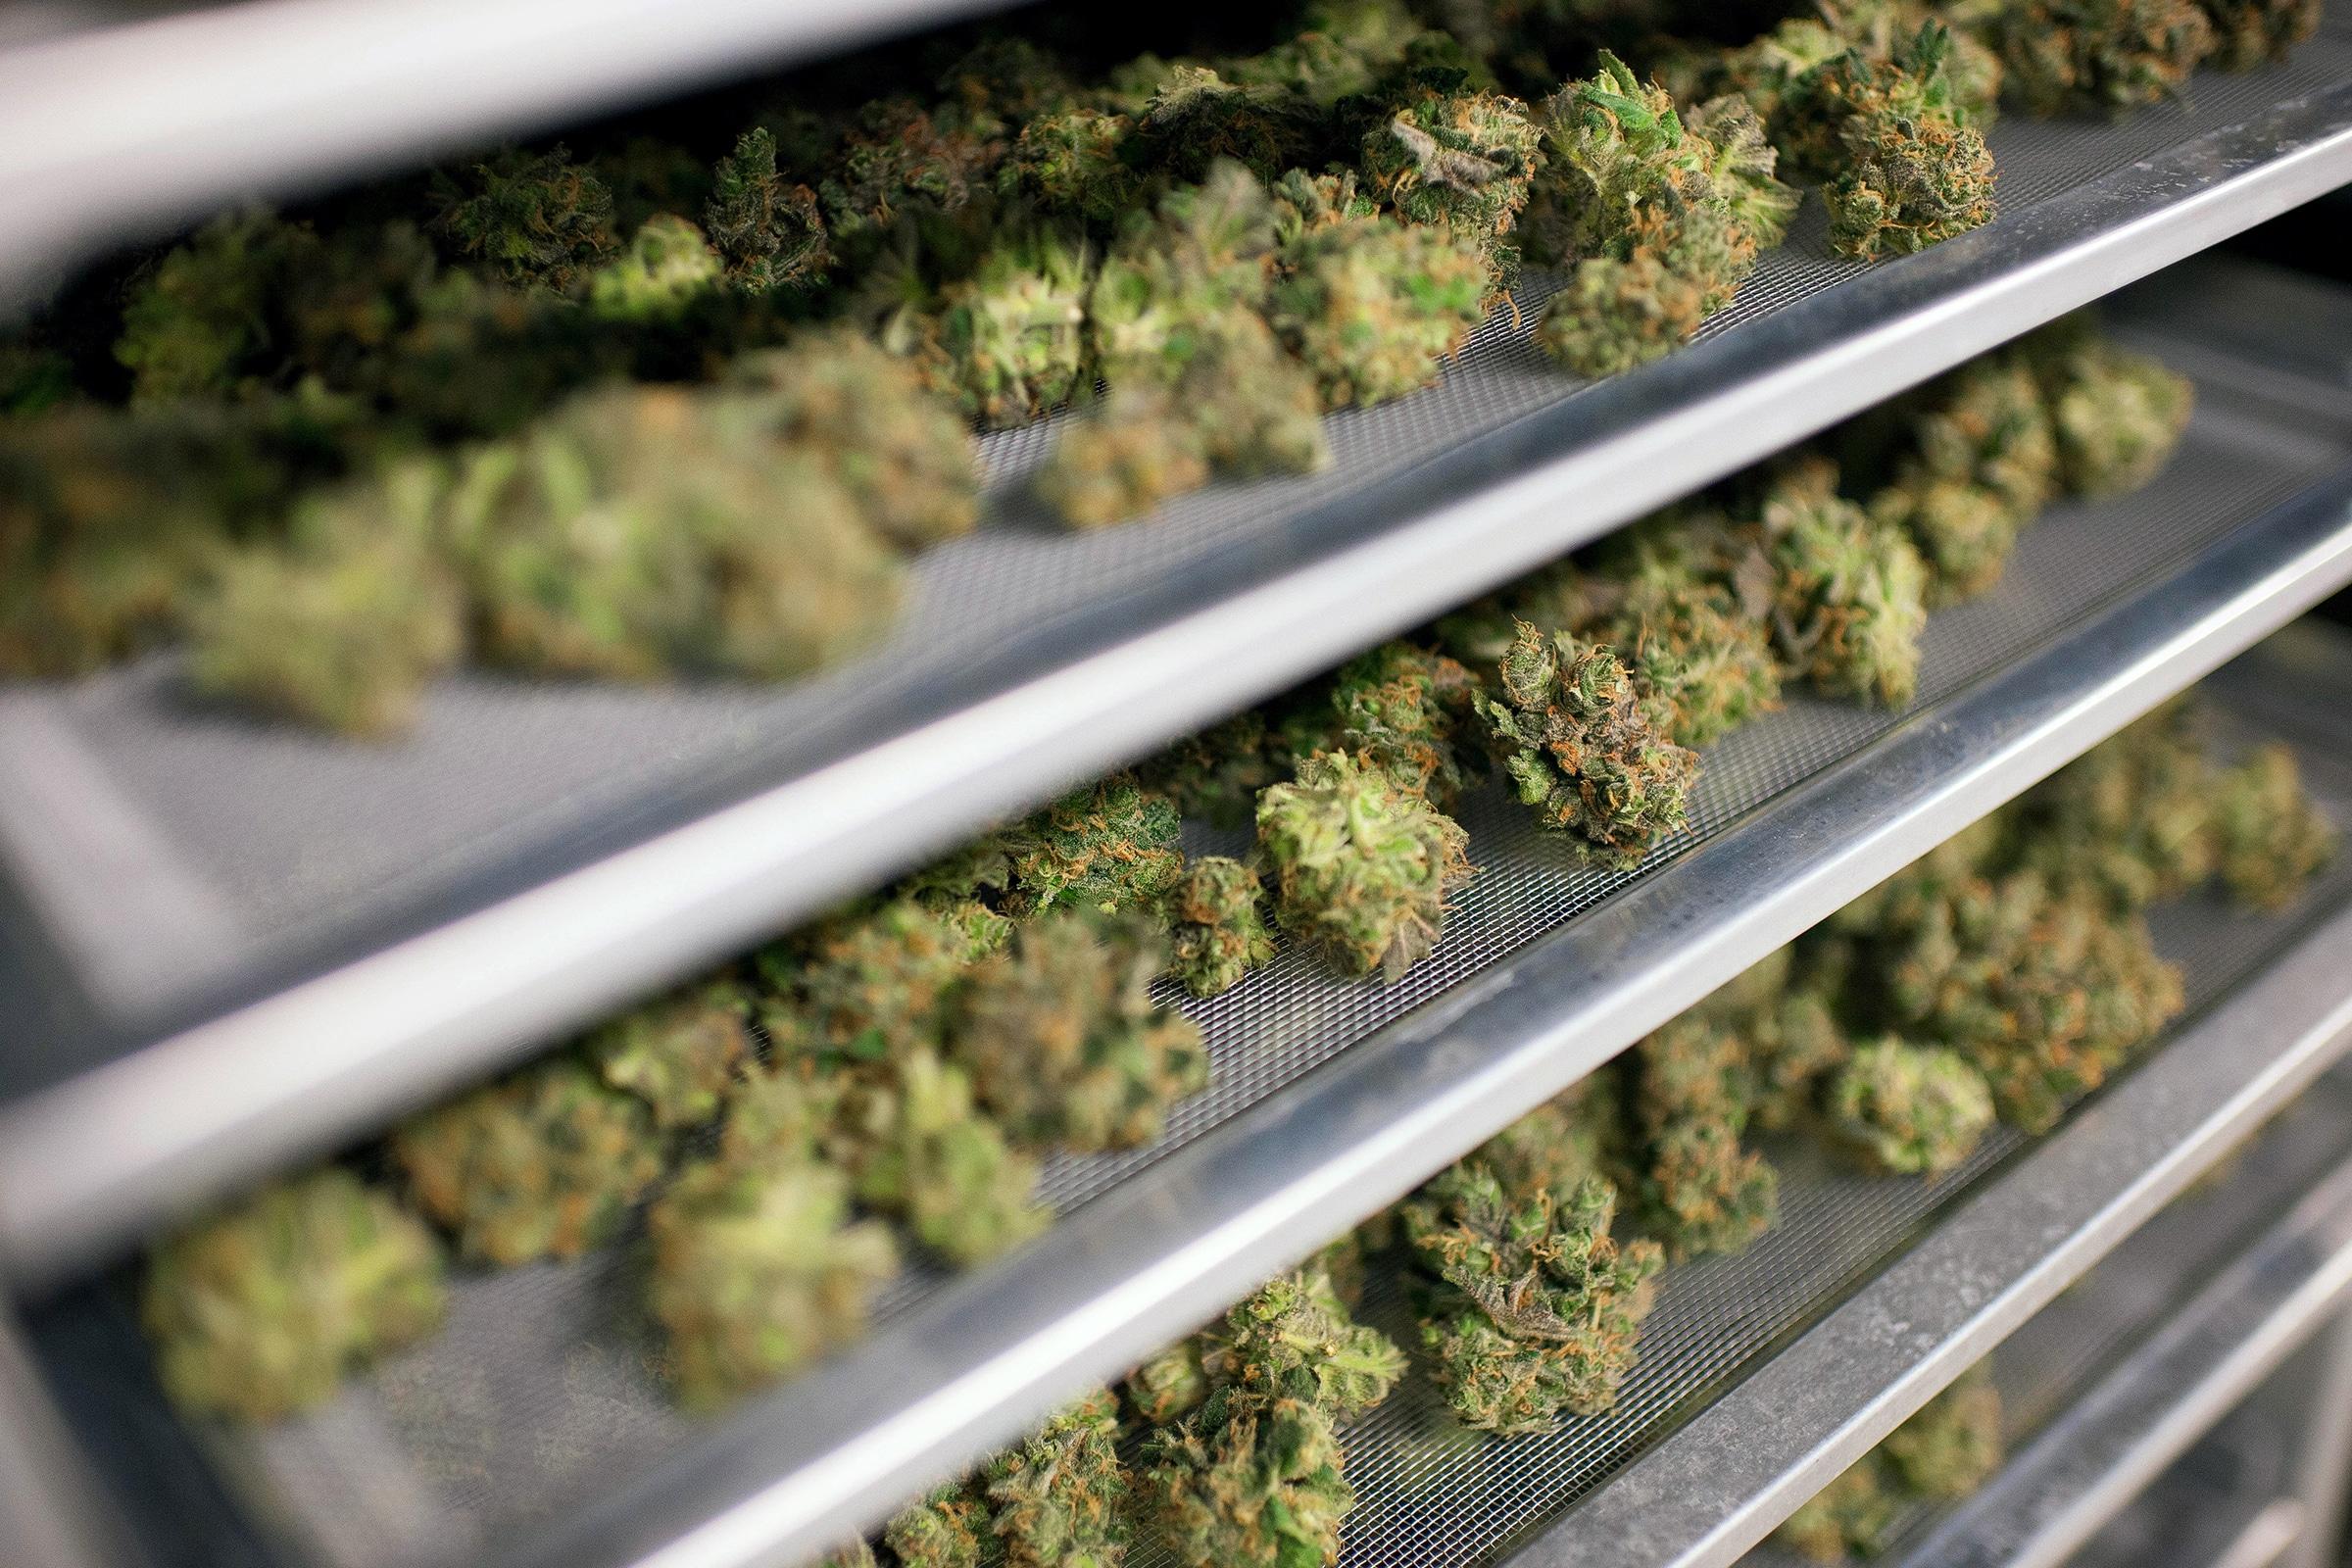 Colorado cannabis industry compliance regulations